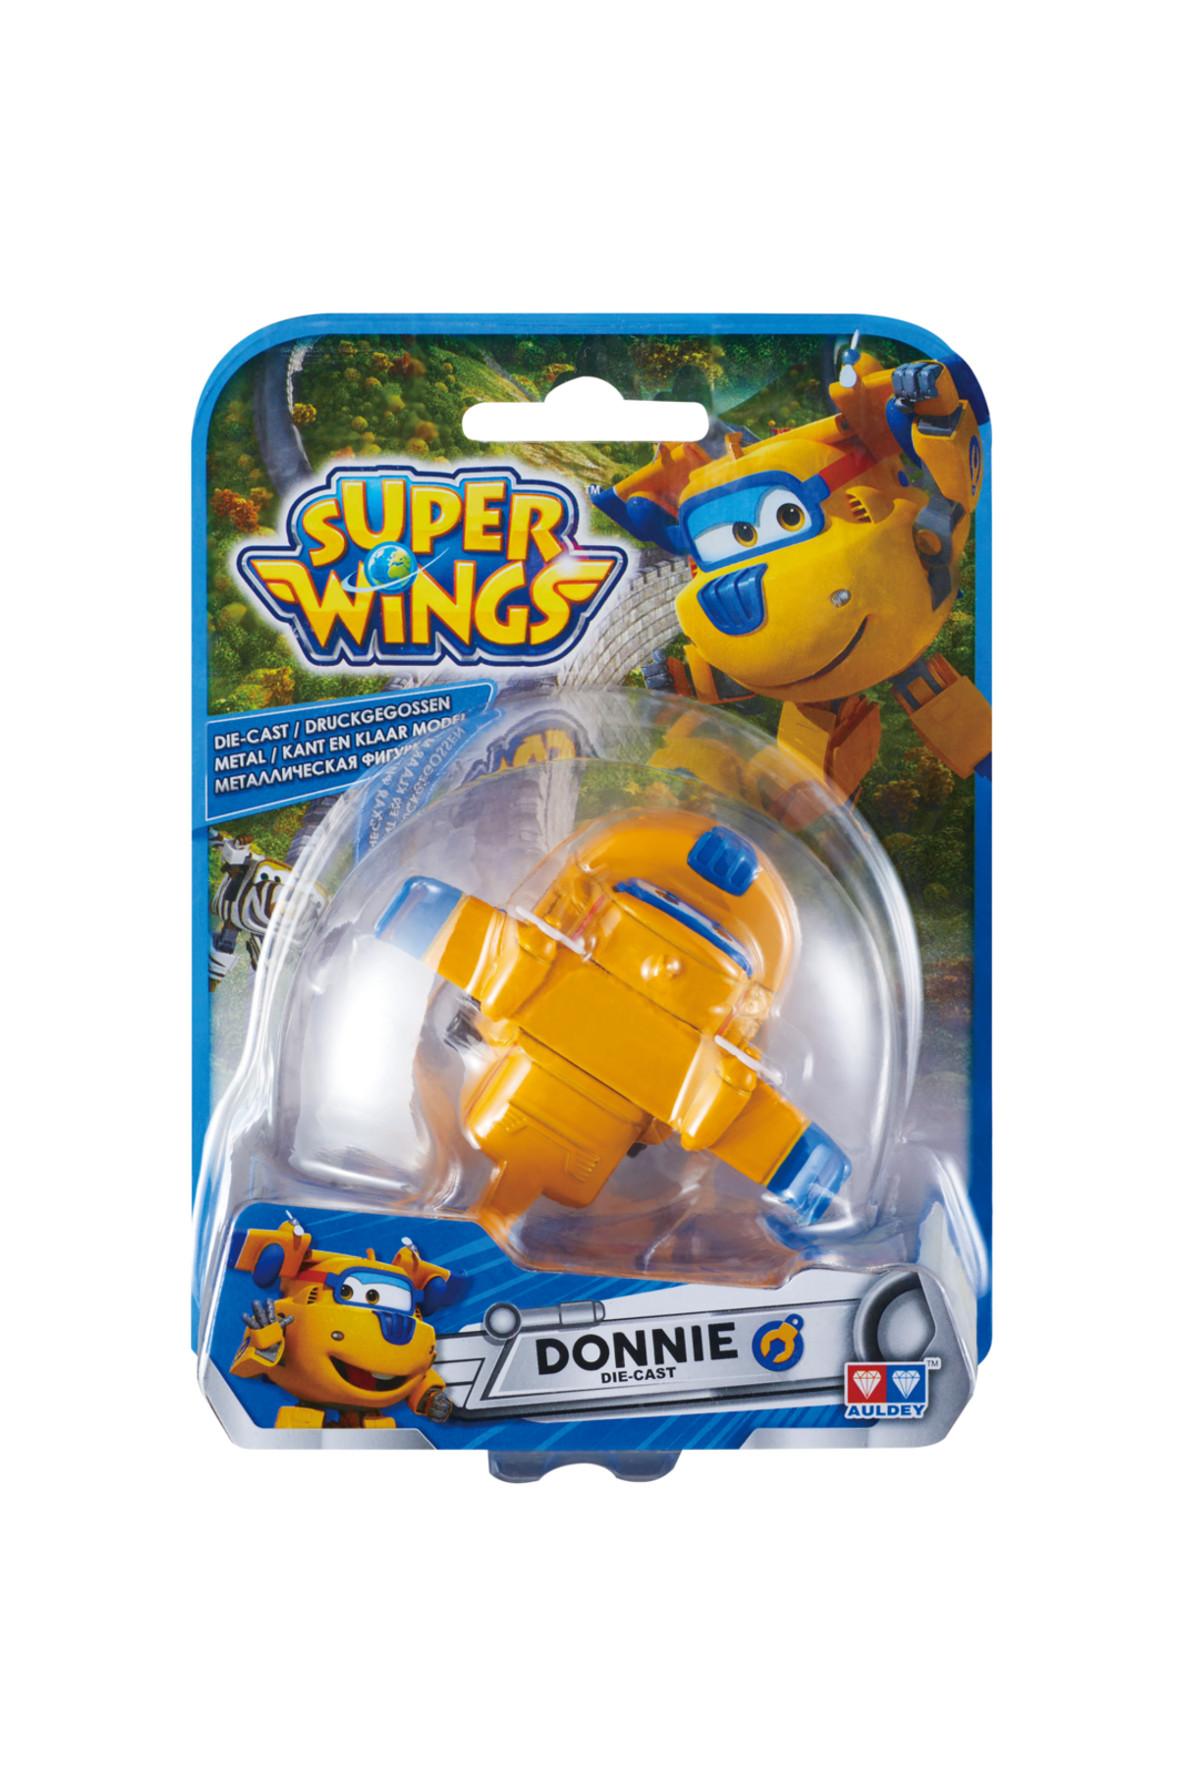 Super Wings samolot Donnie 1Y34EC